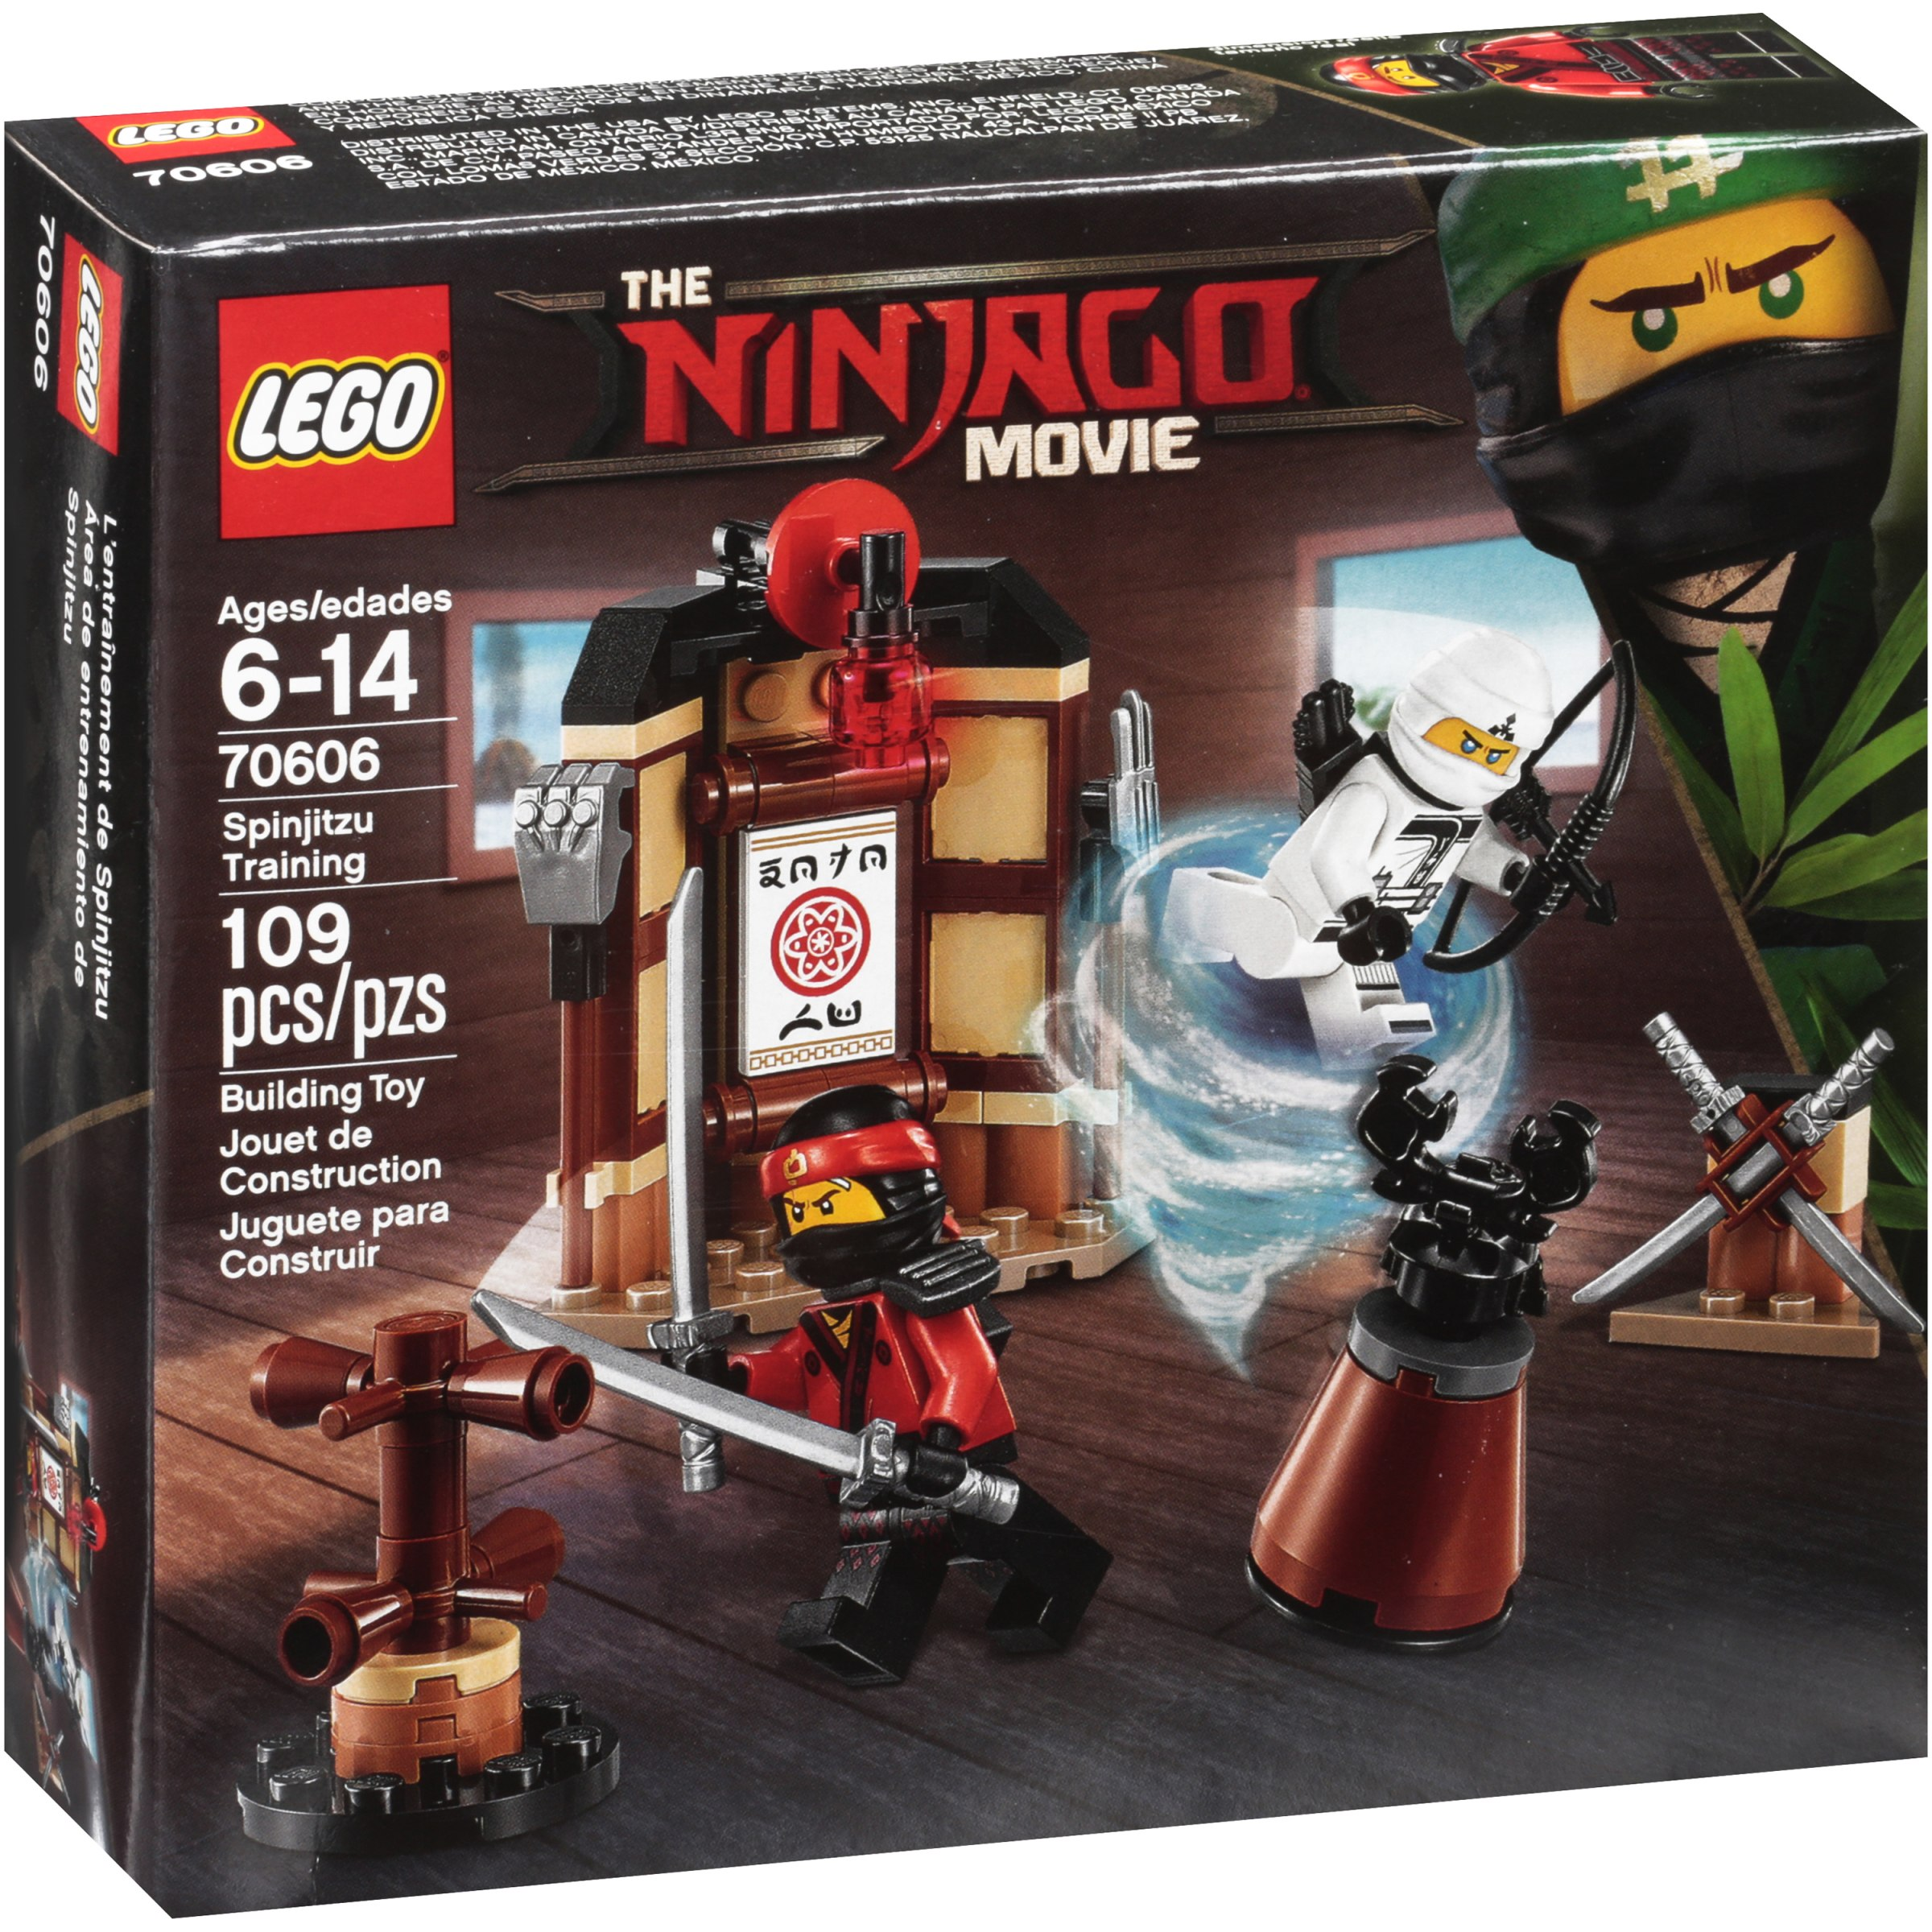 70606 Lego Ninjago Movie Spinjitzu Training 109 Pieces Age 6-14 New Release 2017